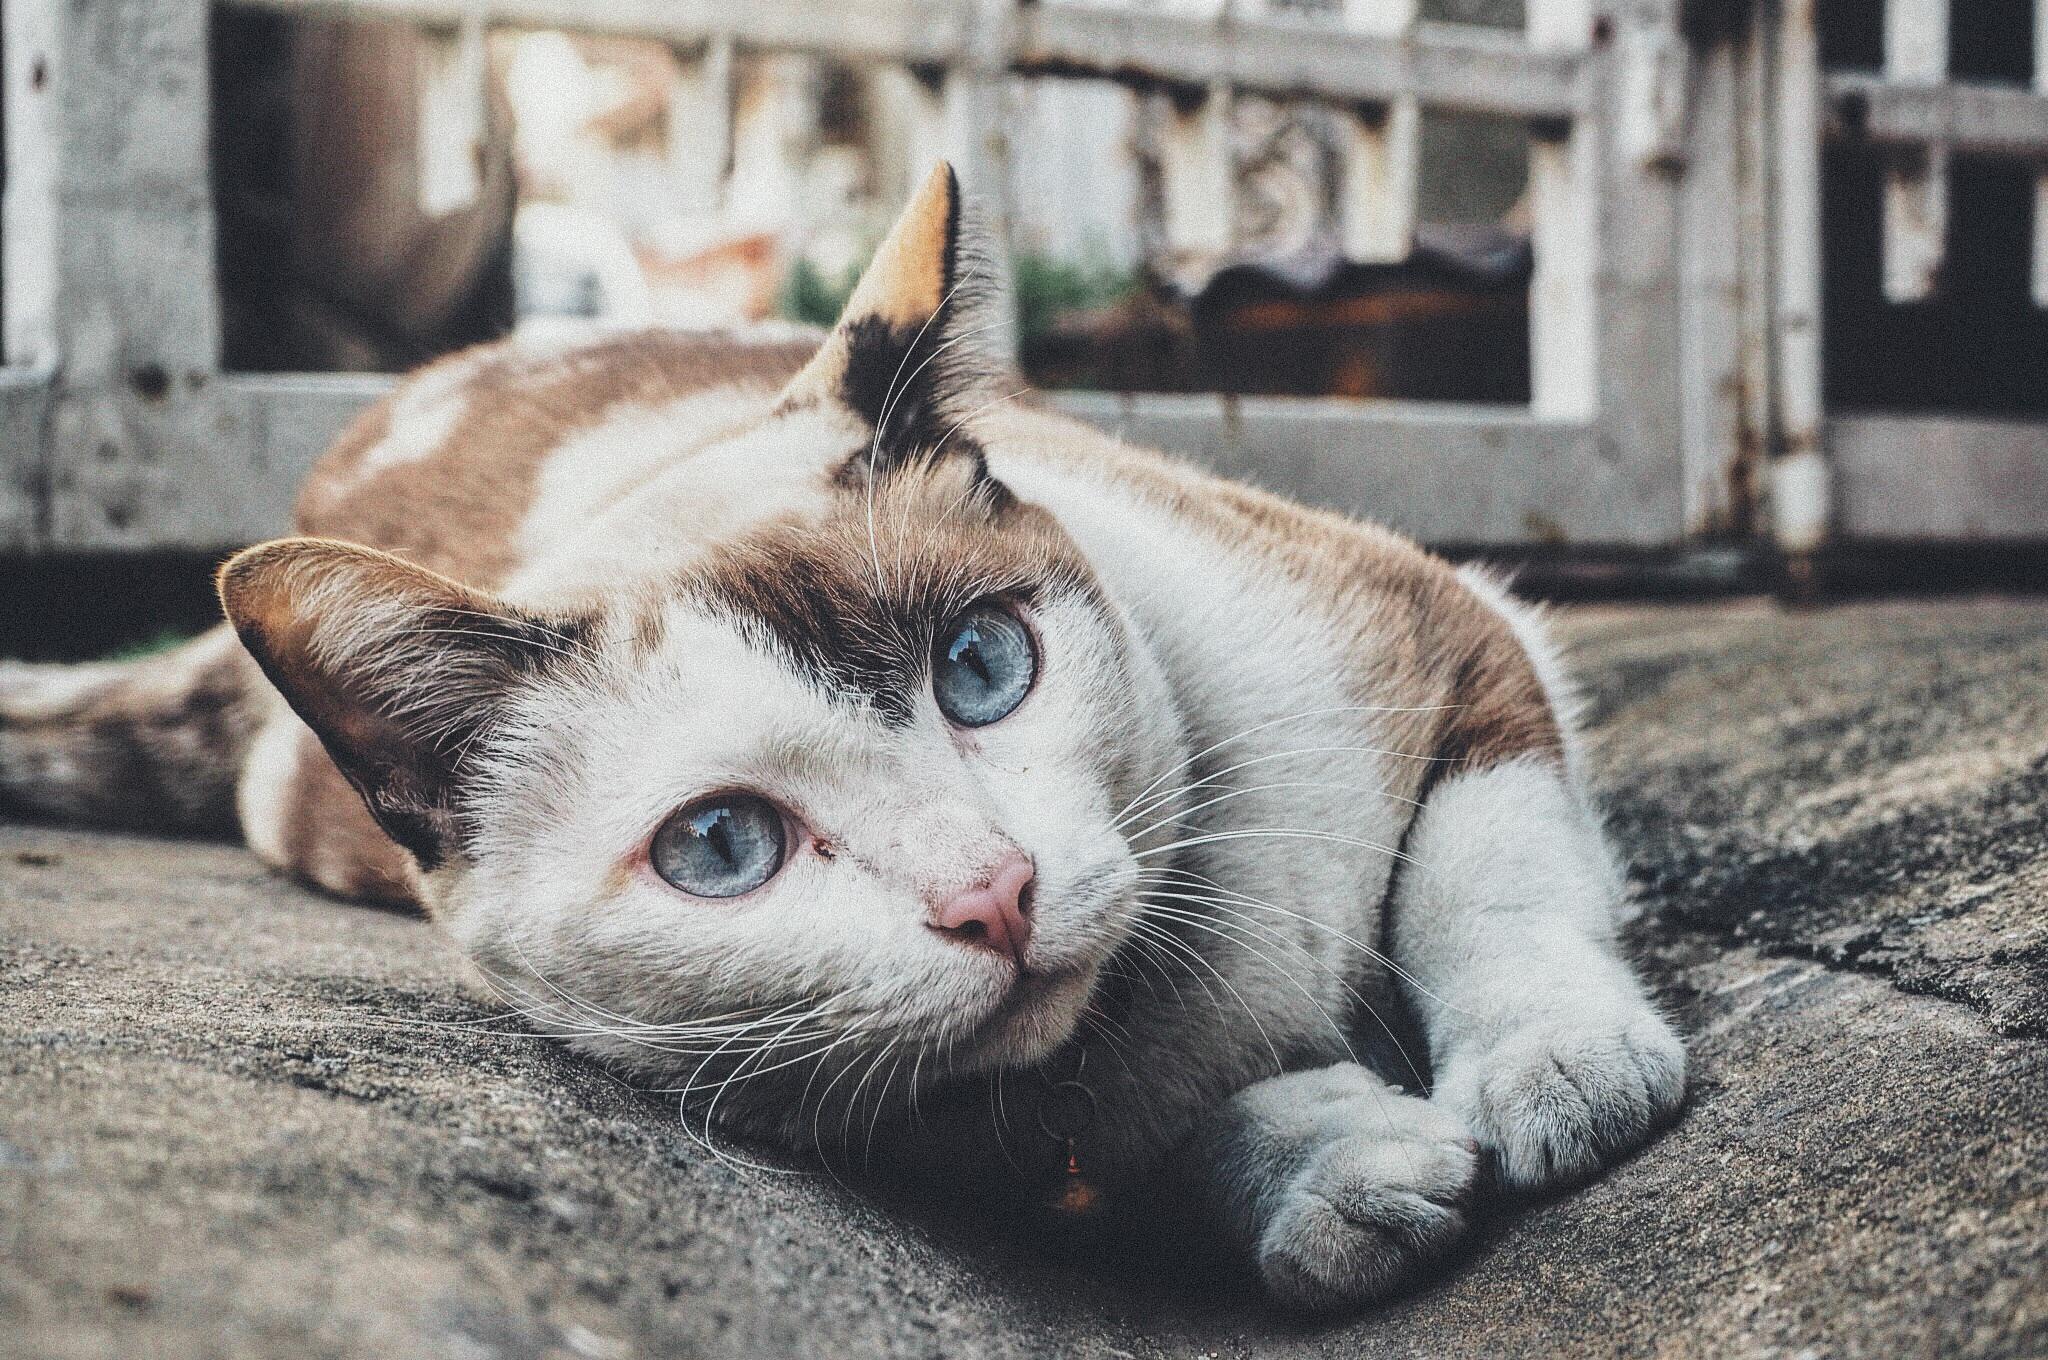 Cute Kitty, Animal, Cat, Friend, Kitty, HQ Photo